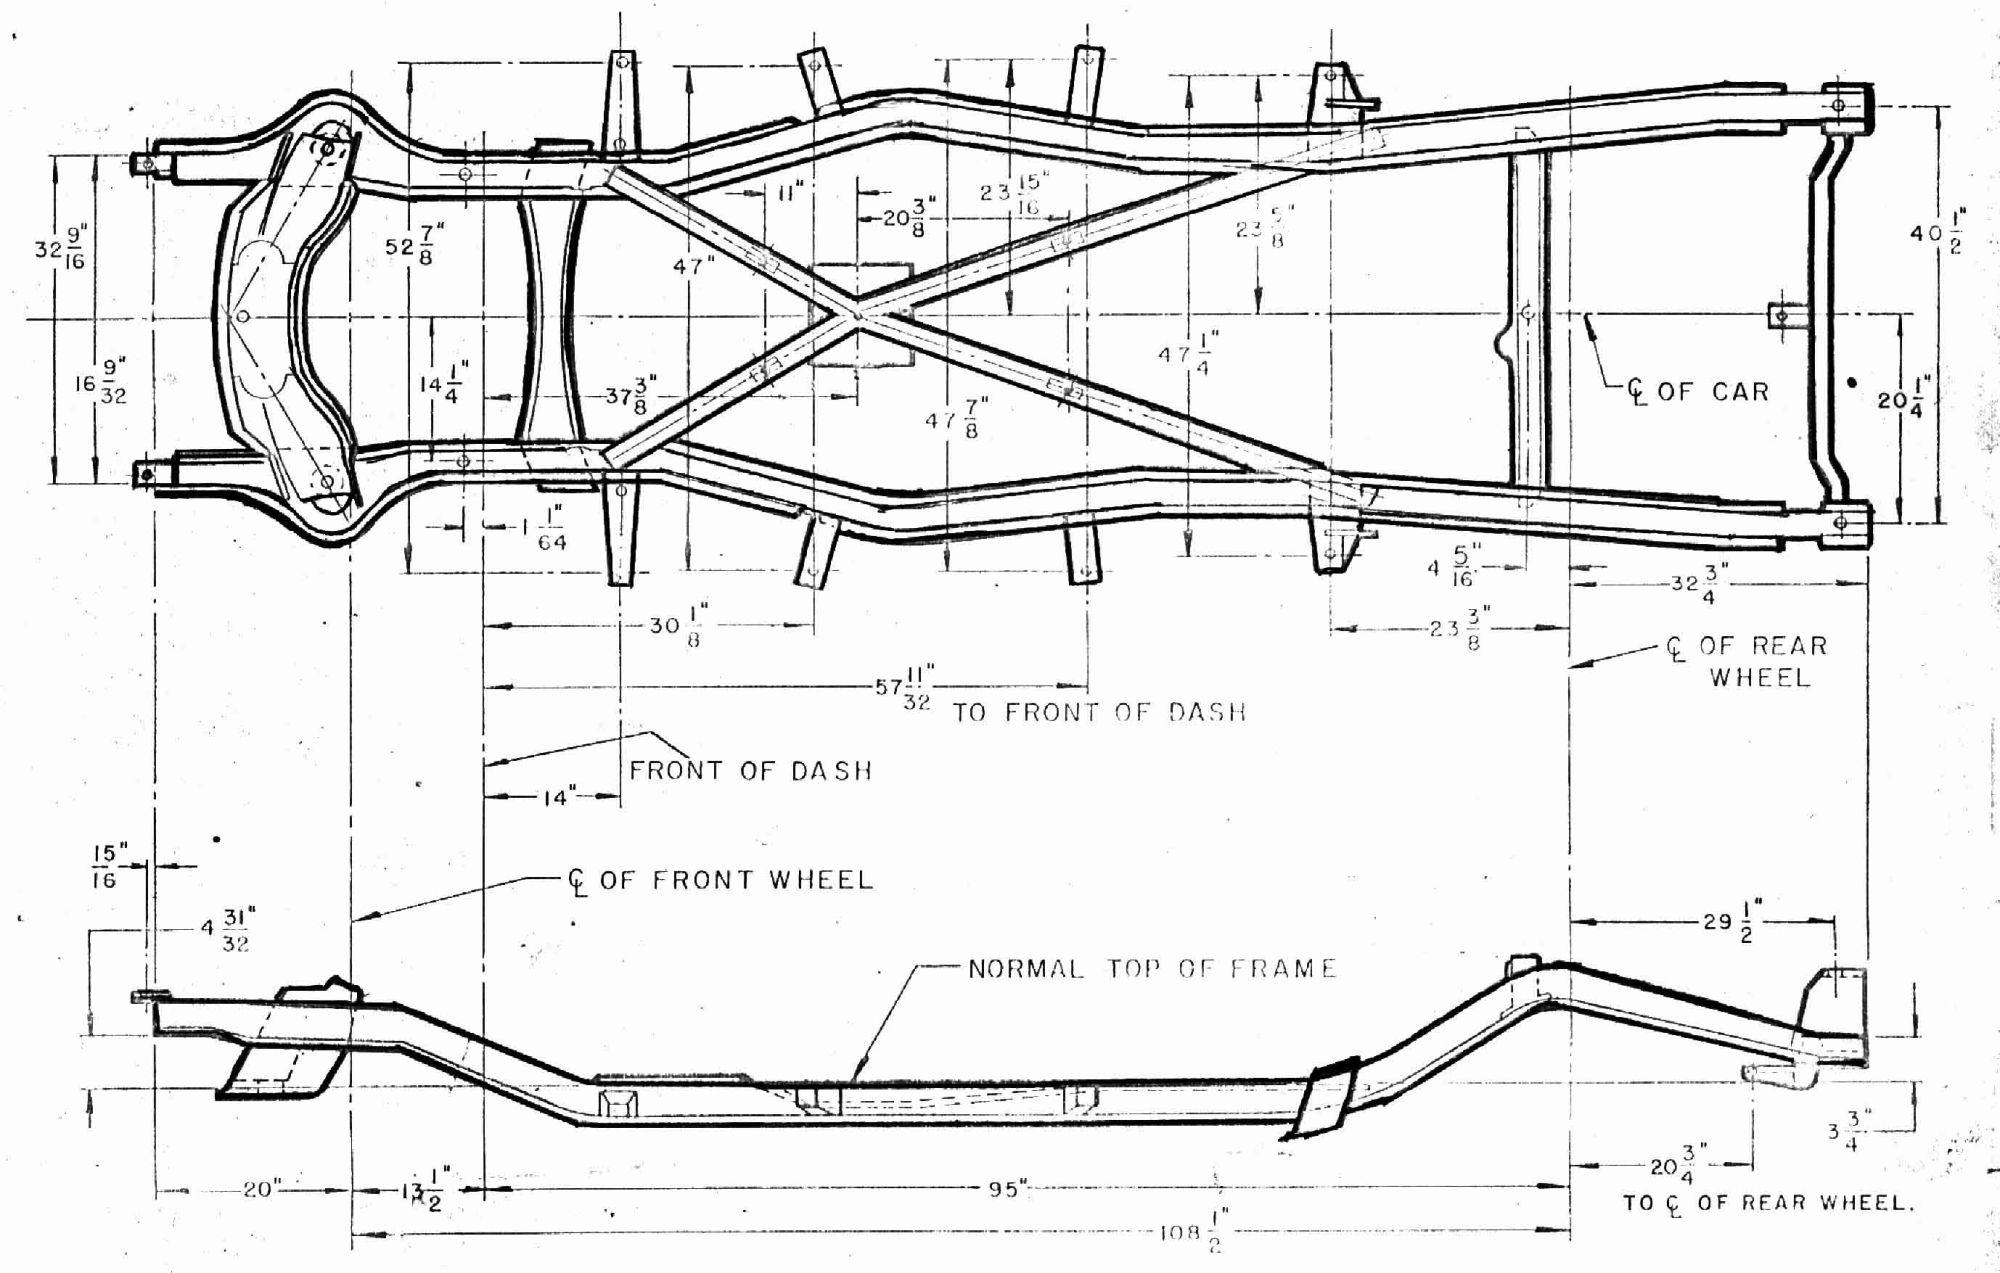 hight resolution of 1963 avanti wiring diagram manual e bookbob johnstone u0027s studebaker and avanti page